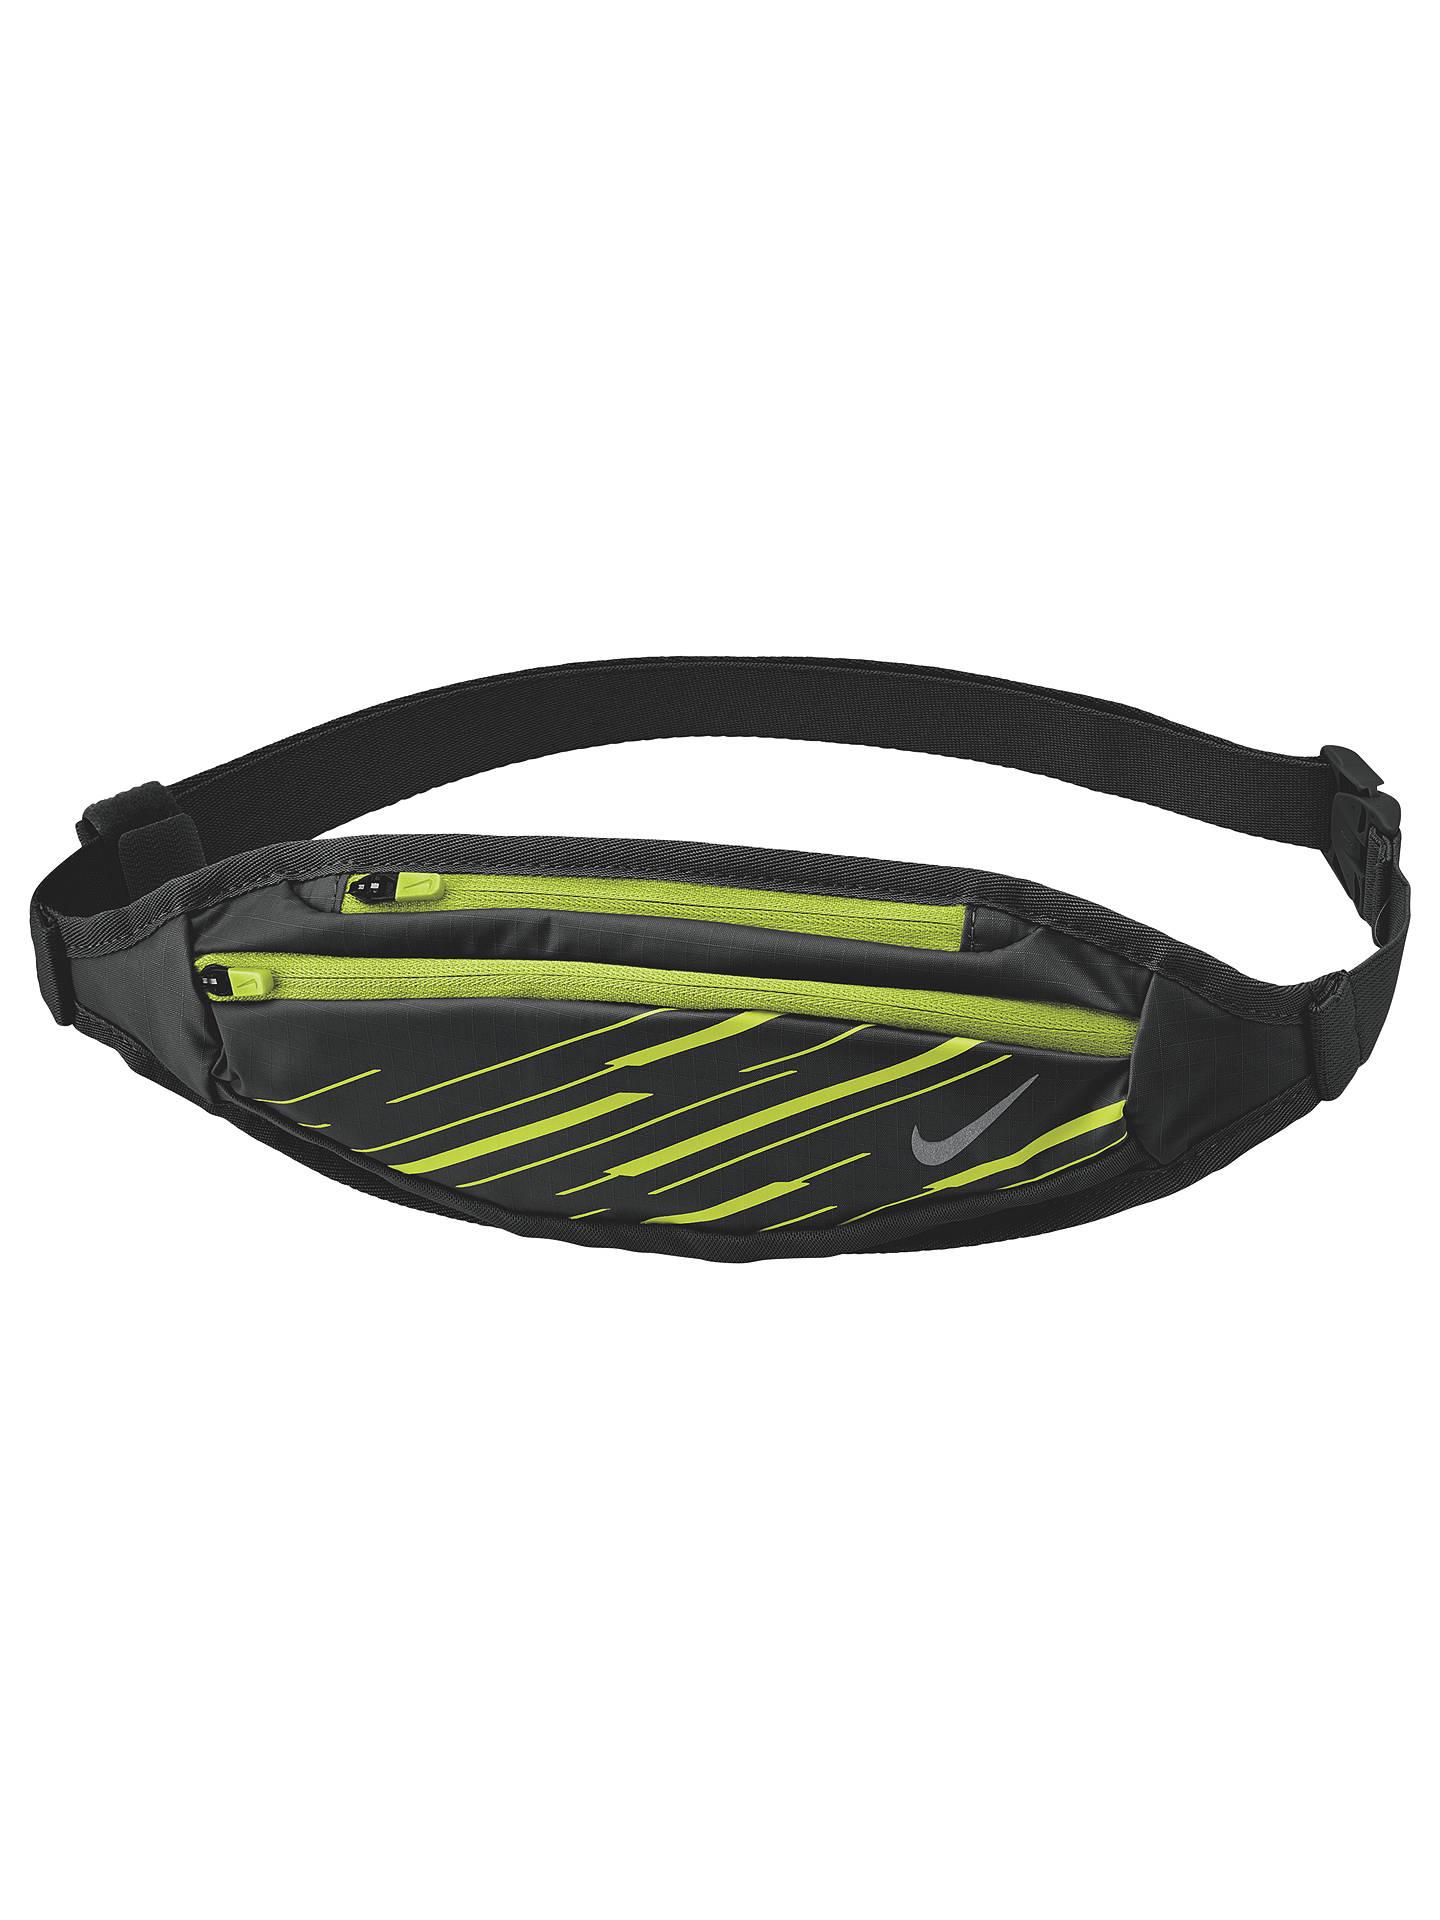 buy popular e908d 1549d Buy Nike Capacity Waistpack, Black Volt Silver Online at johnlewis.com